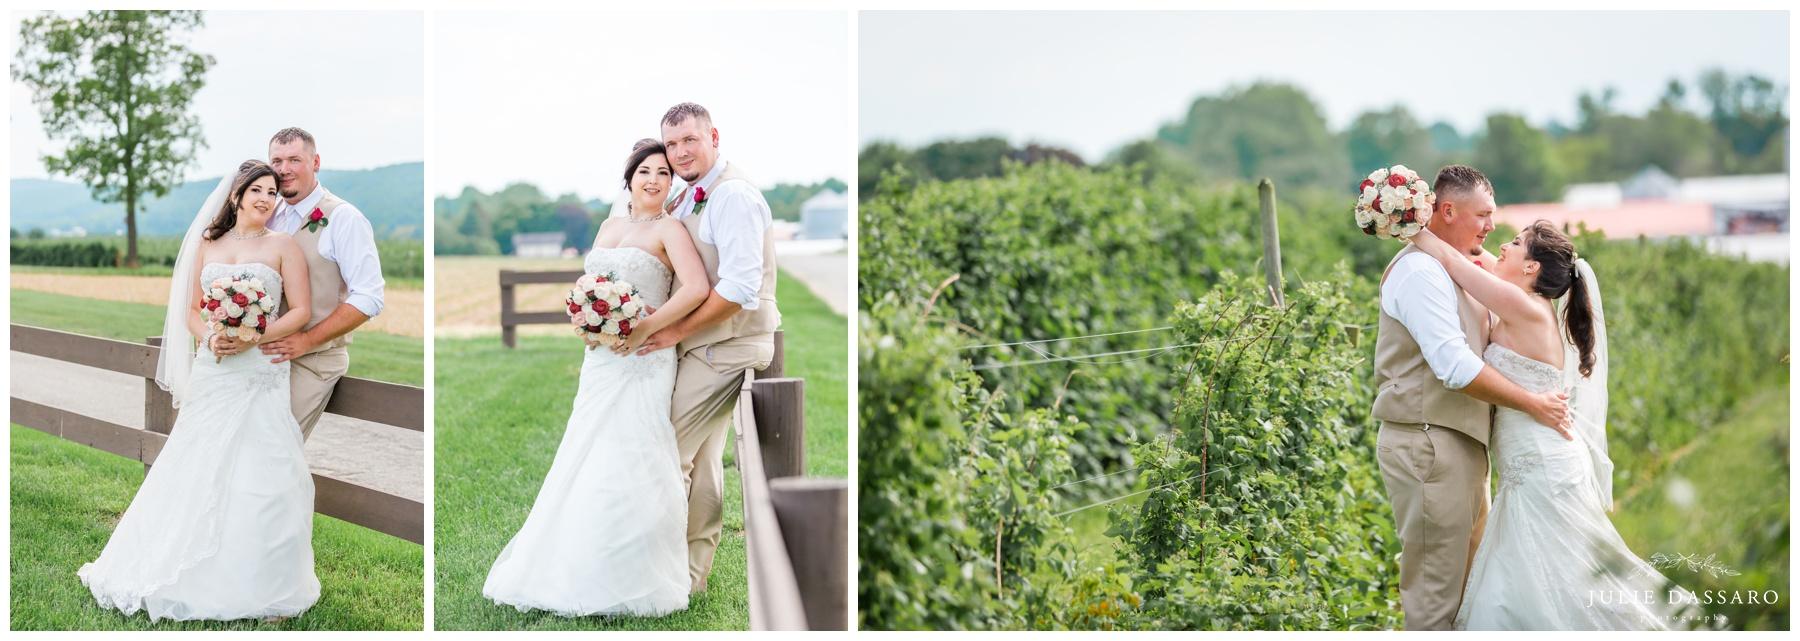 bride and groom portraits lush greenery